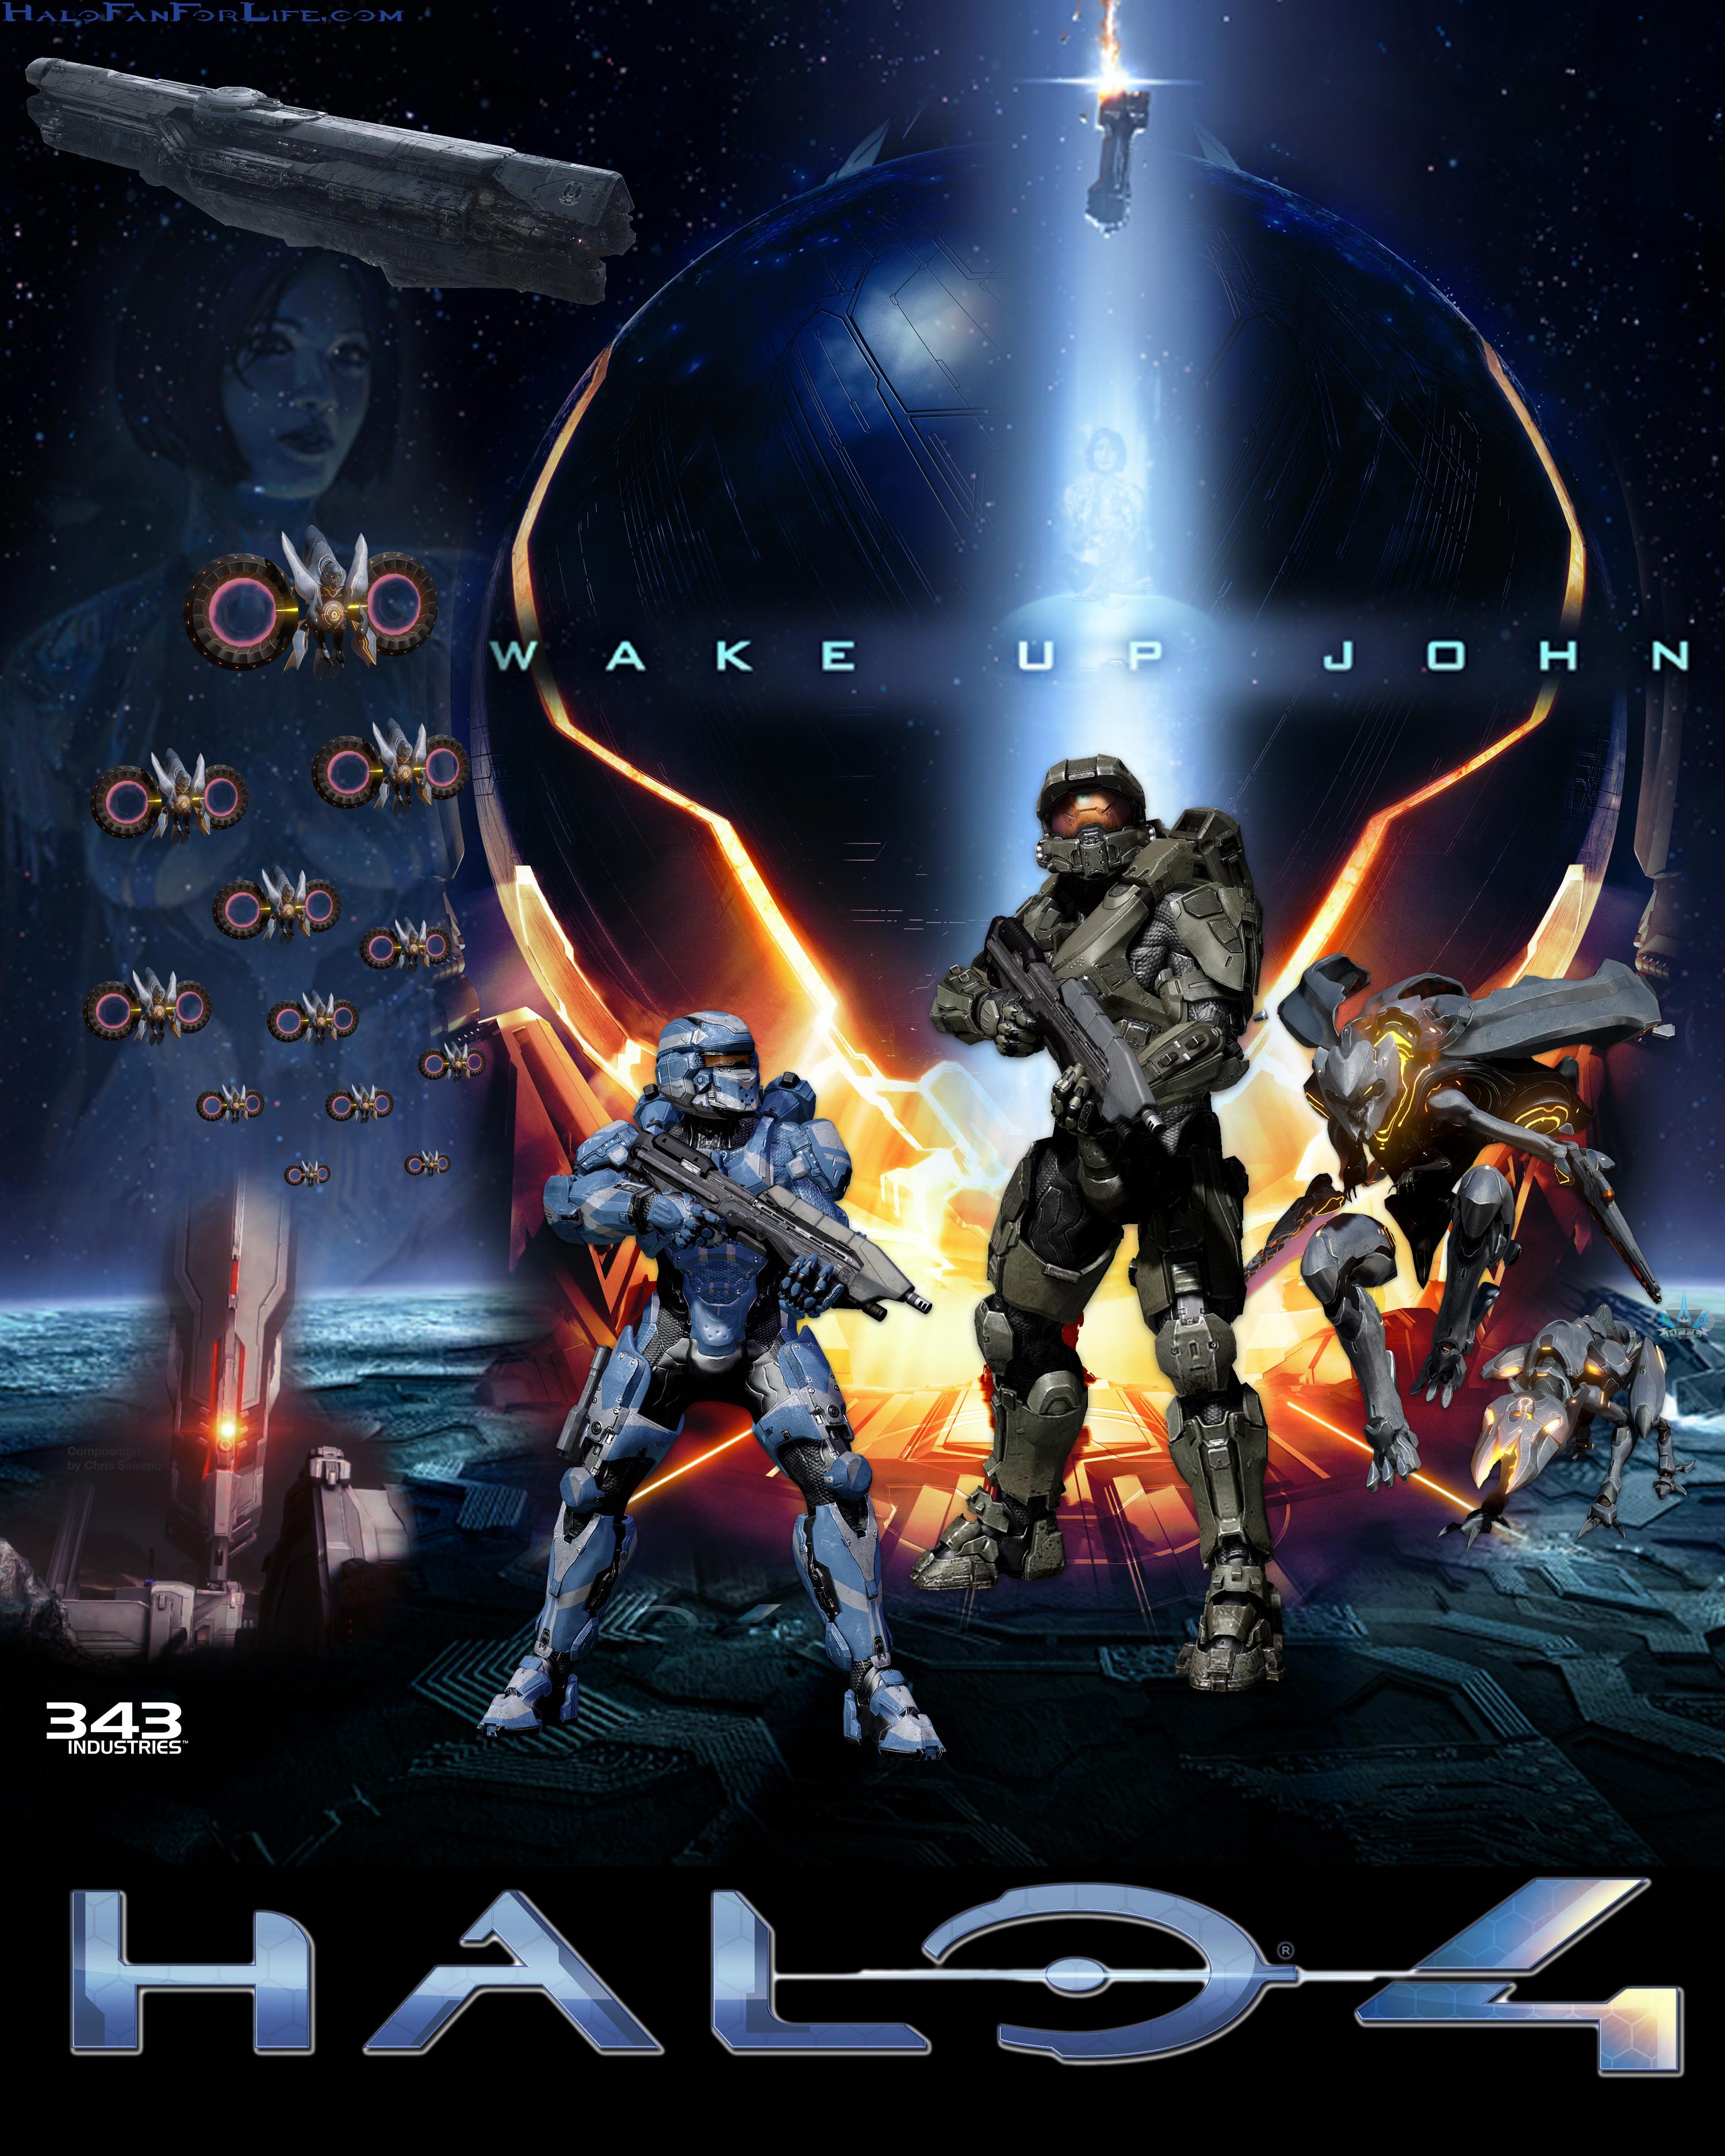 Halo 4 parody of Star Wars movie poster  | HaloFanForLife